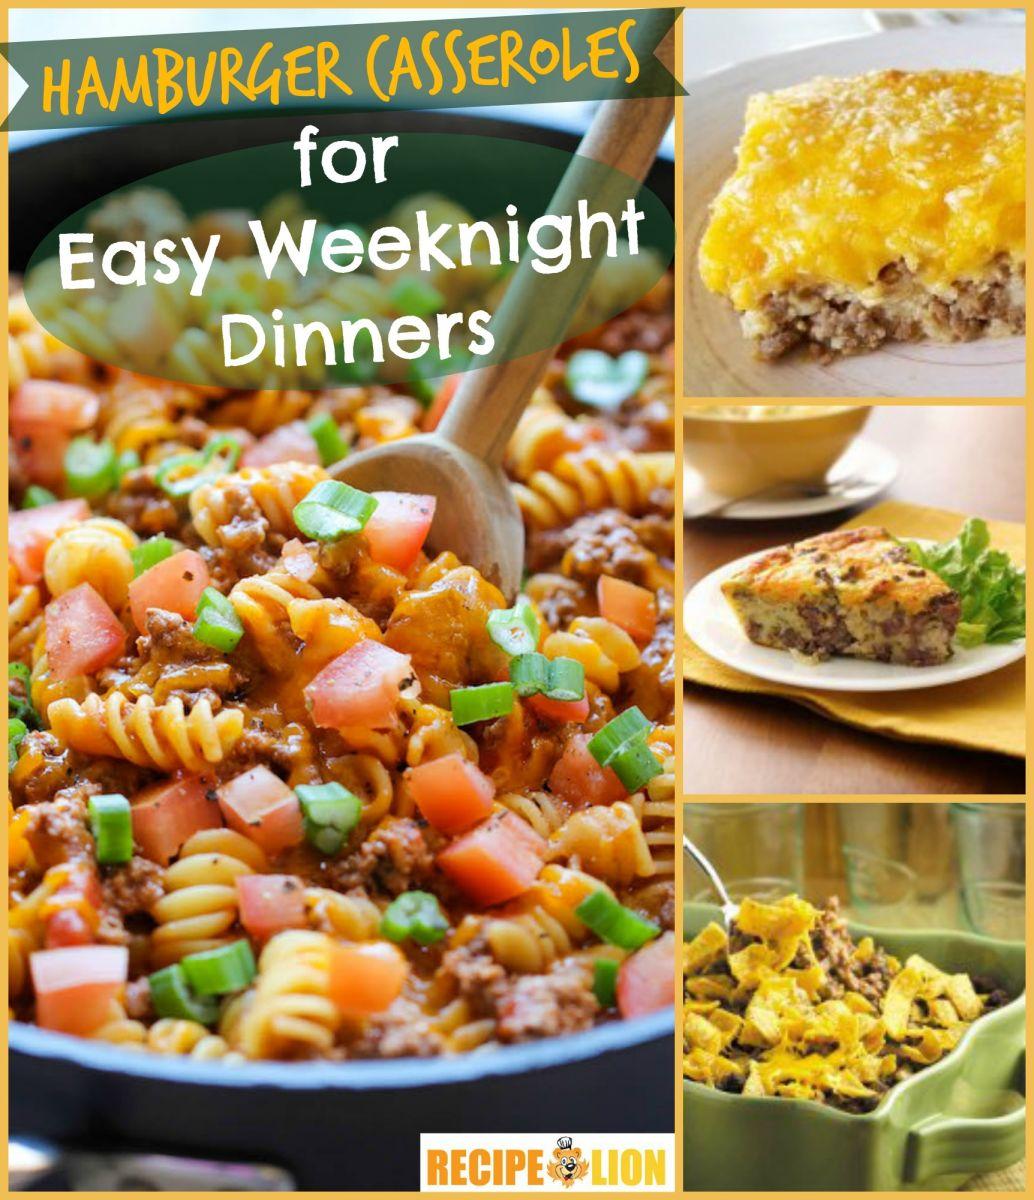 13 Hamburger Casserole Recipes For Easy Weeknight Dinners